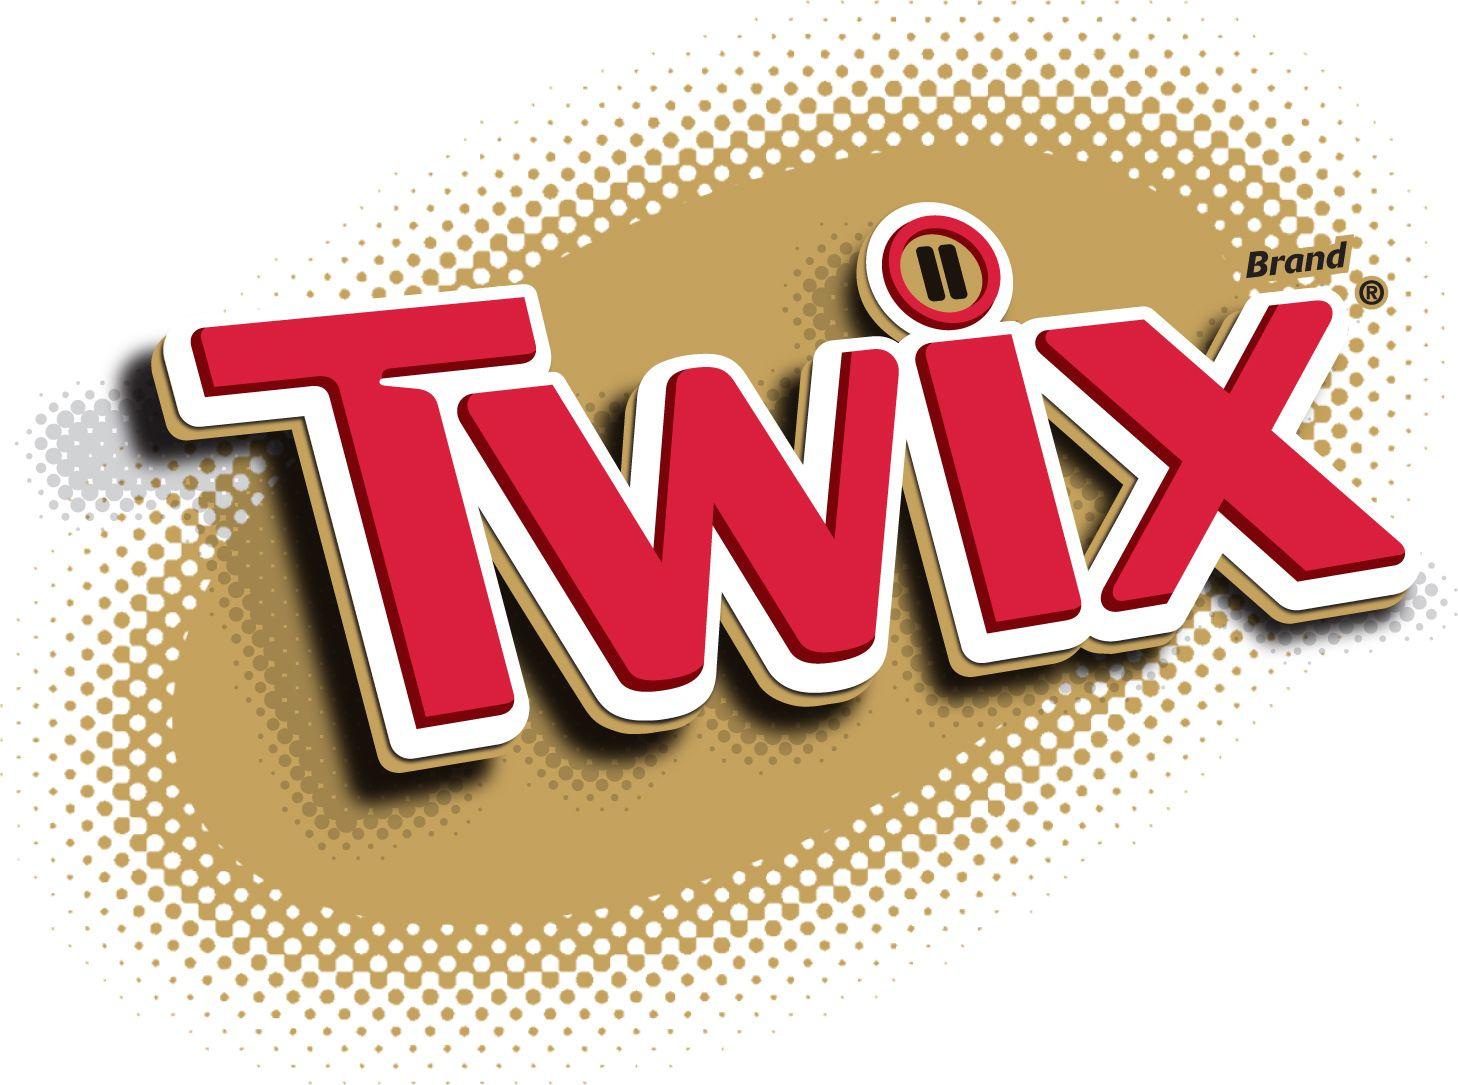 Twix Cholocate Candy Bar logo.